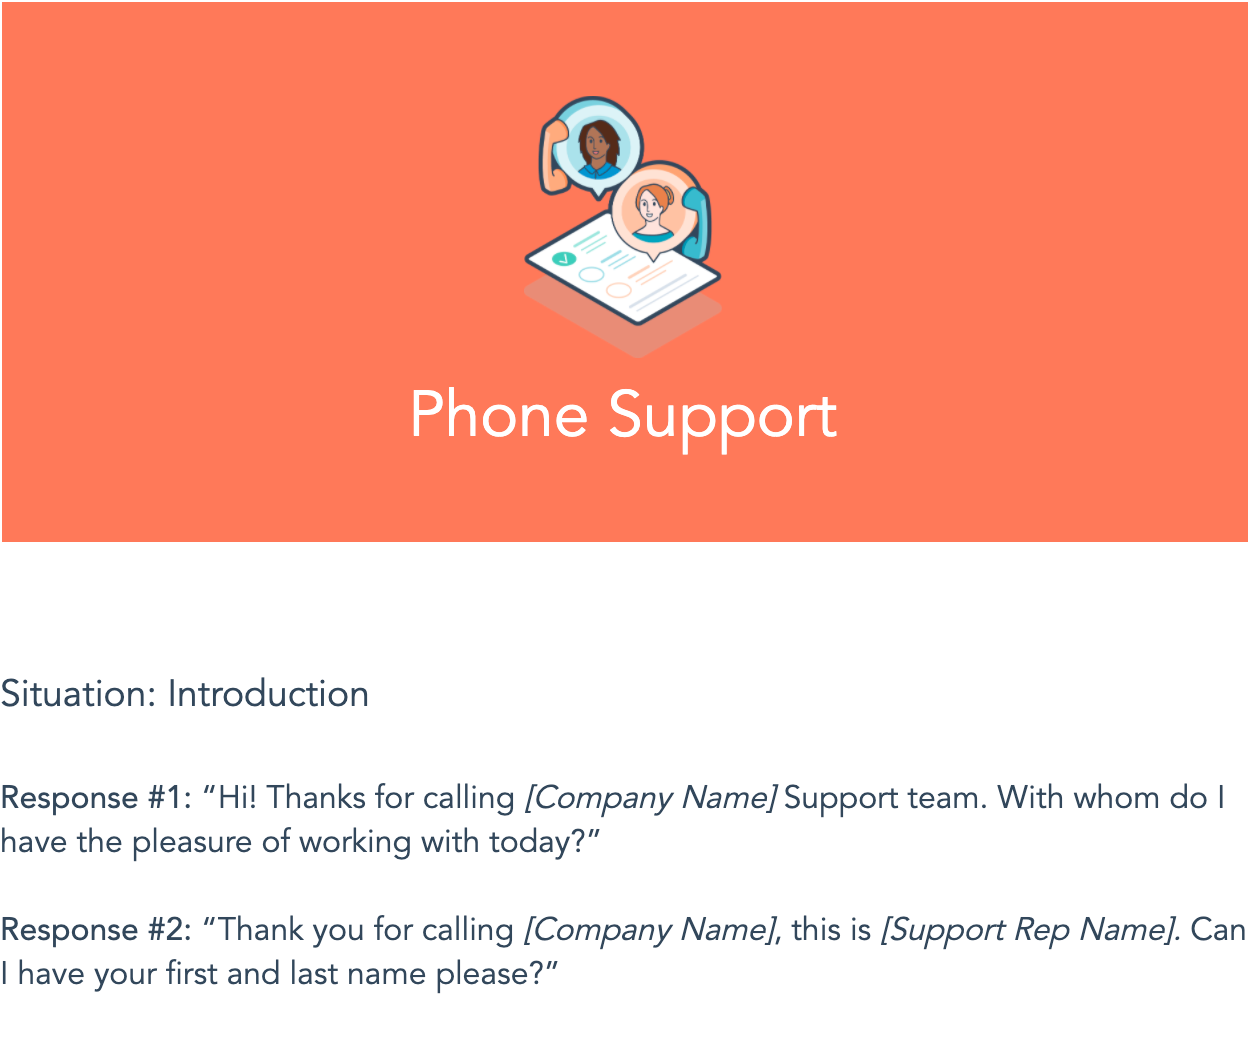 Phone Support script from HubSpot